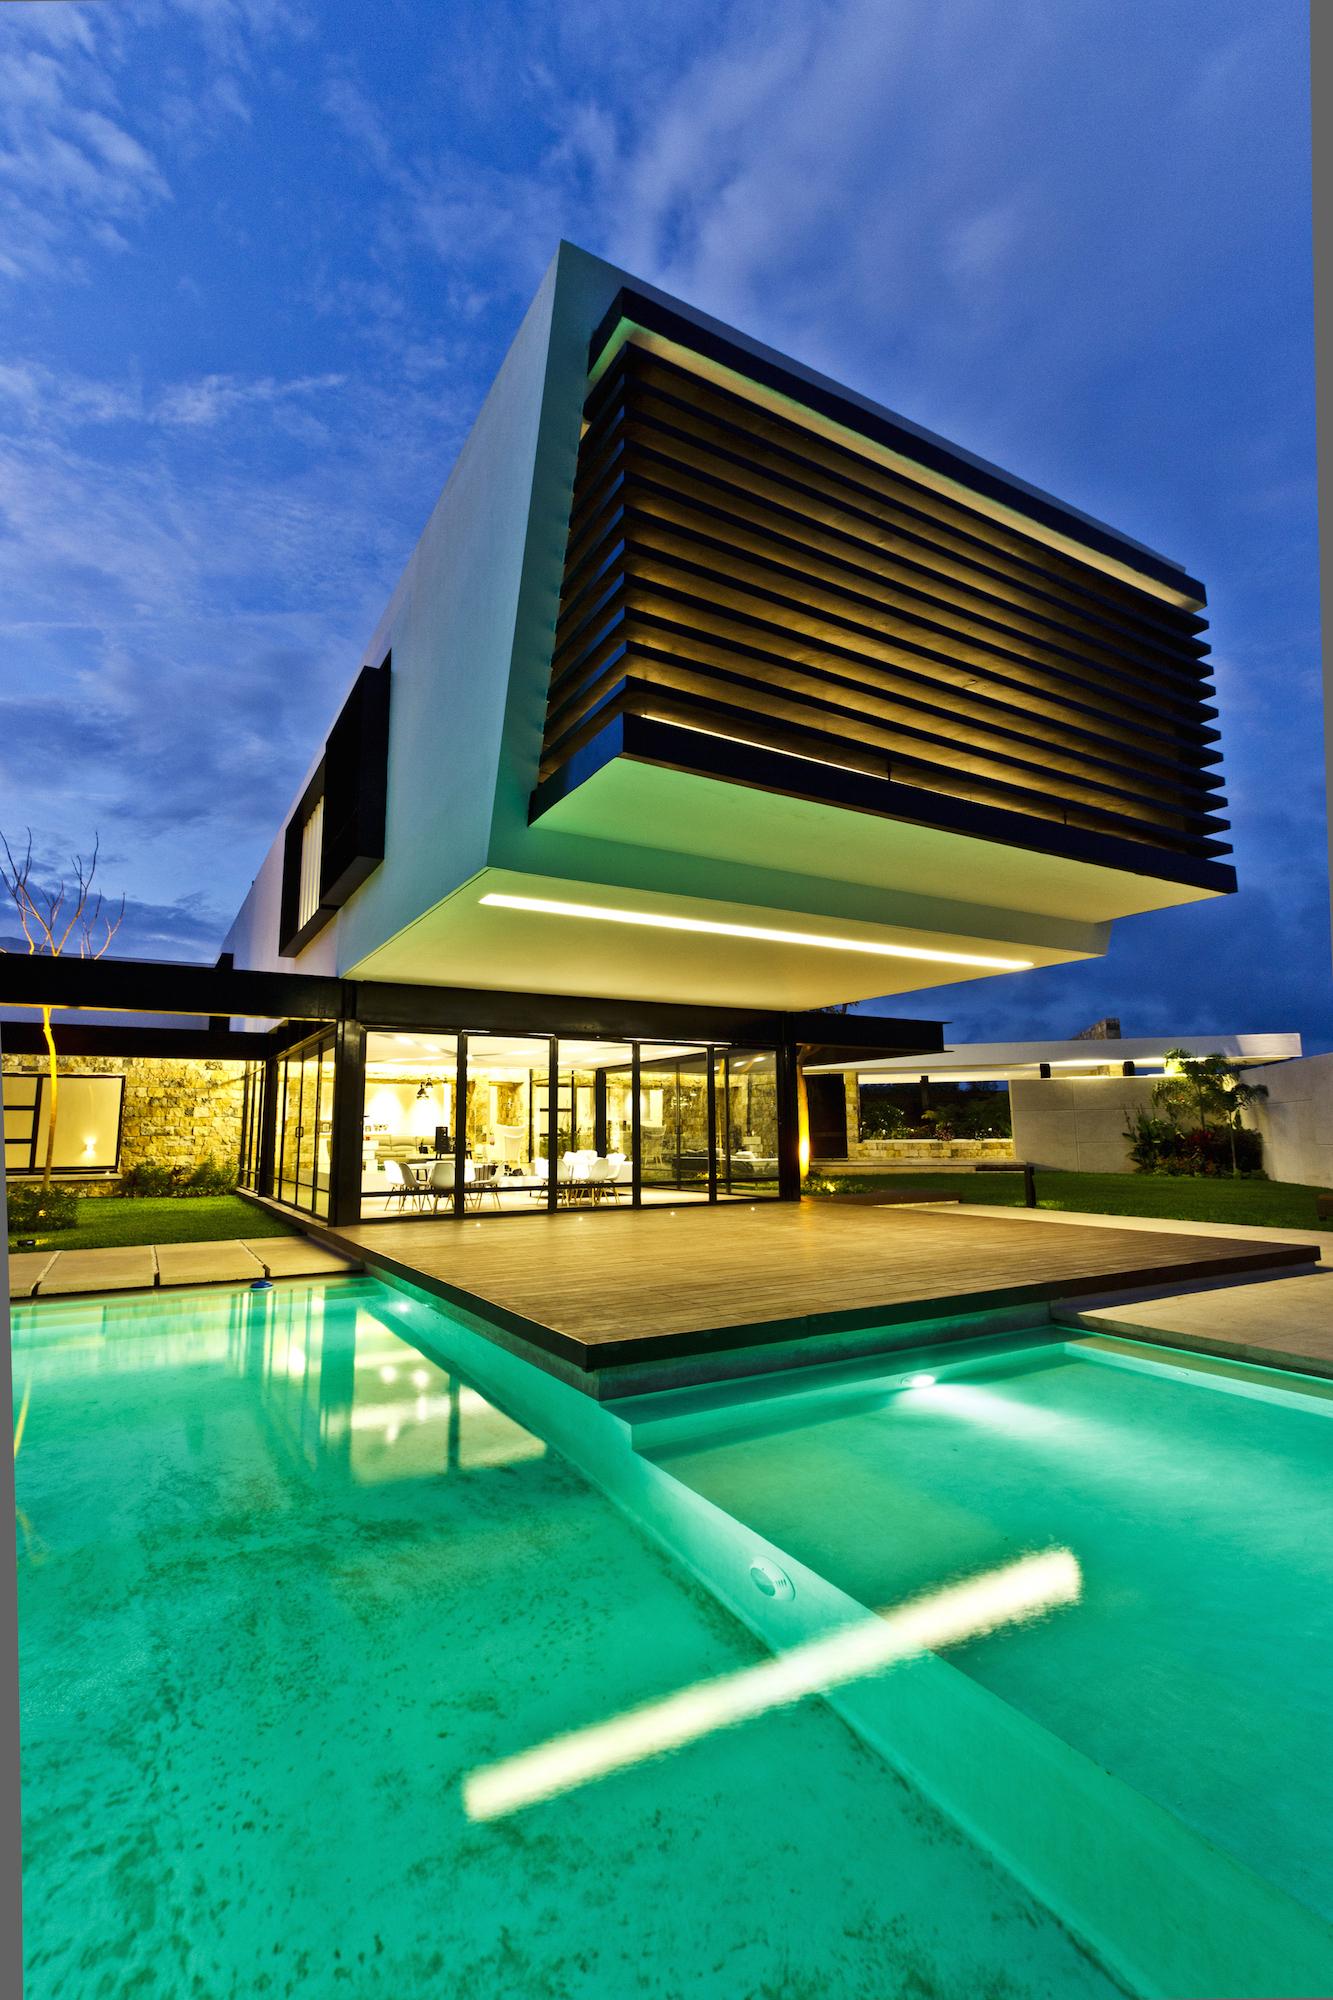 5305f41be8e44ed91b000005_temozon-house-carrillo-arquitectos-y-asociados_temozon_foto_09